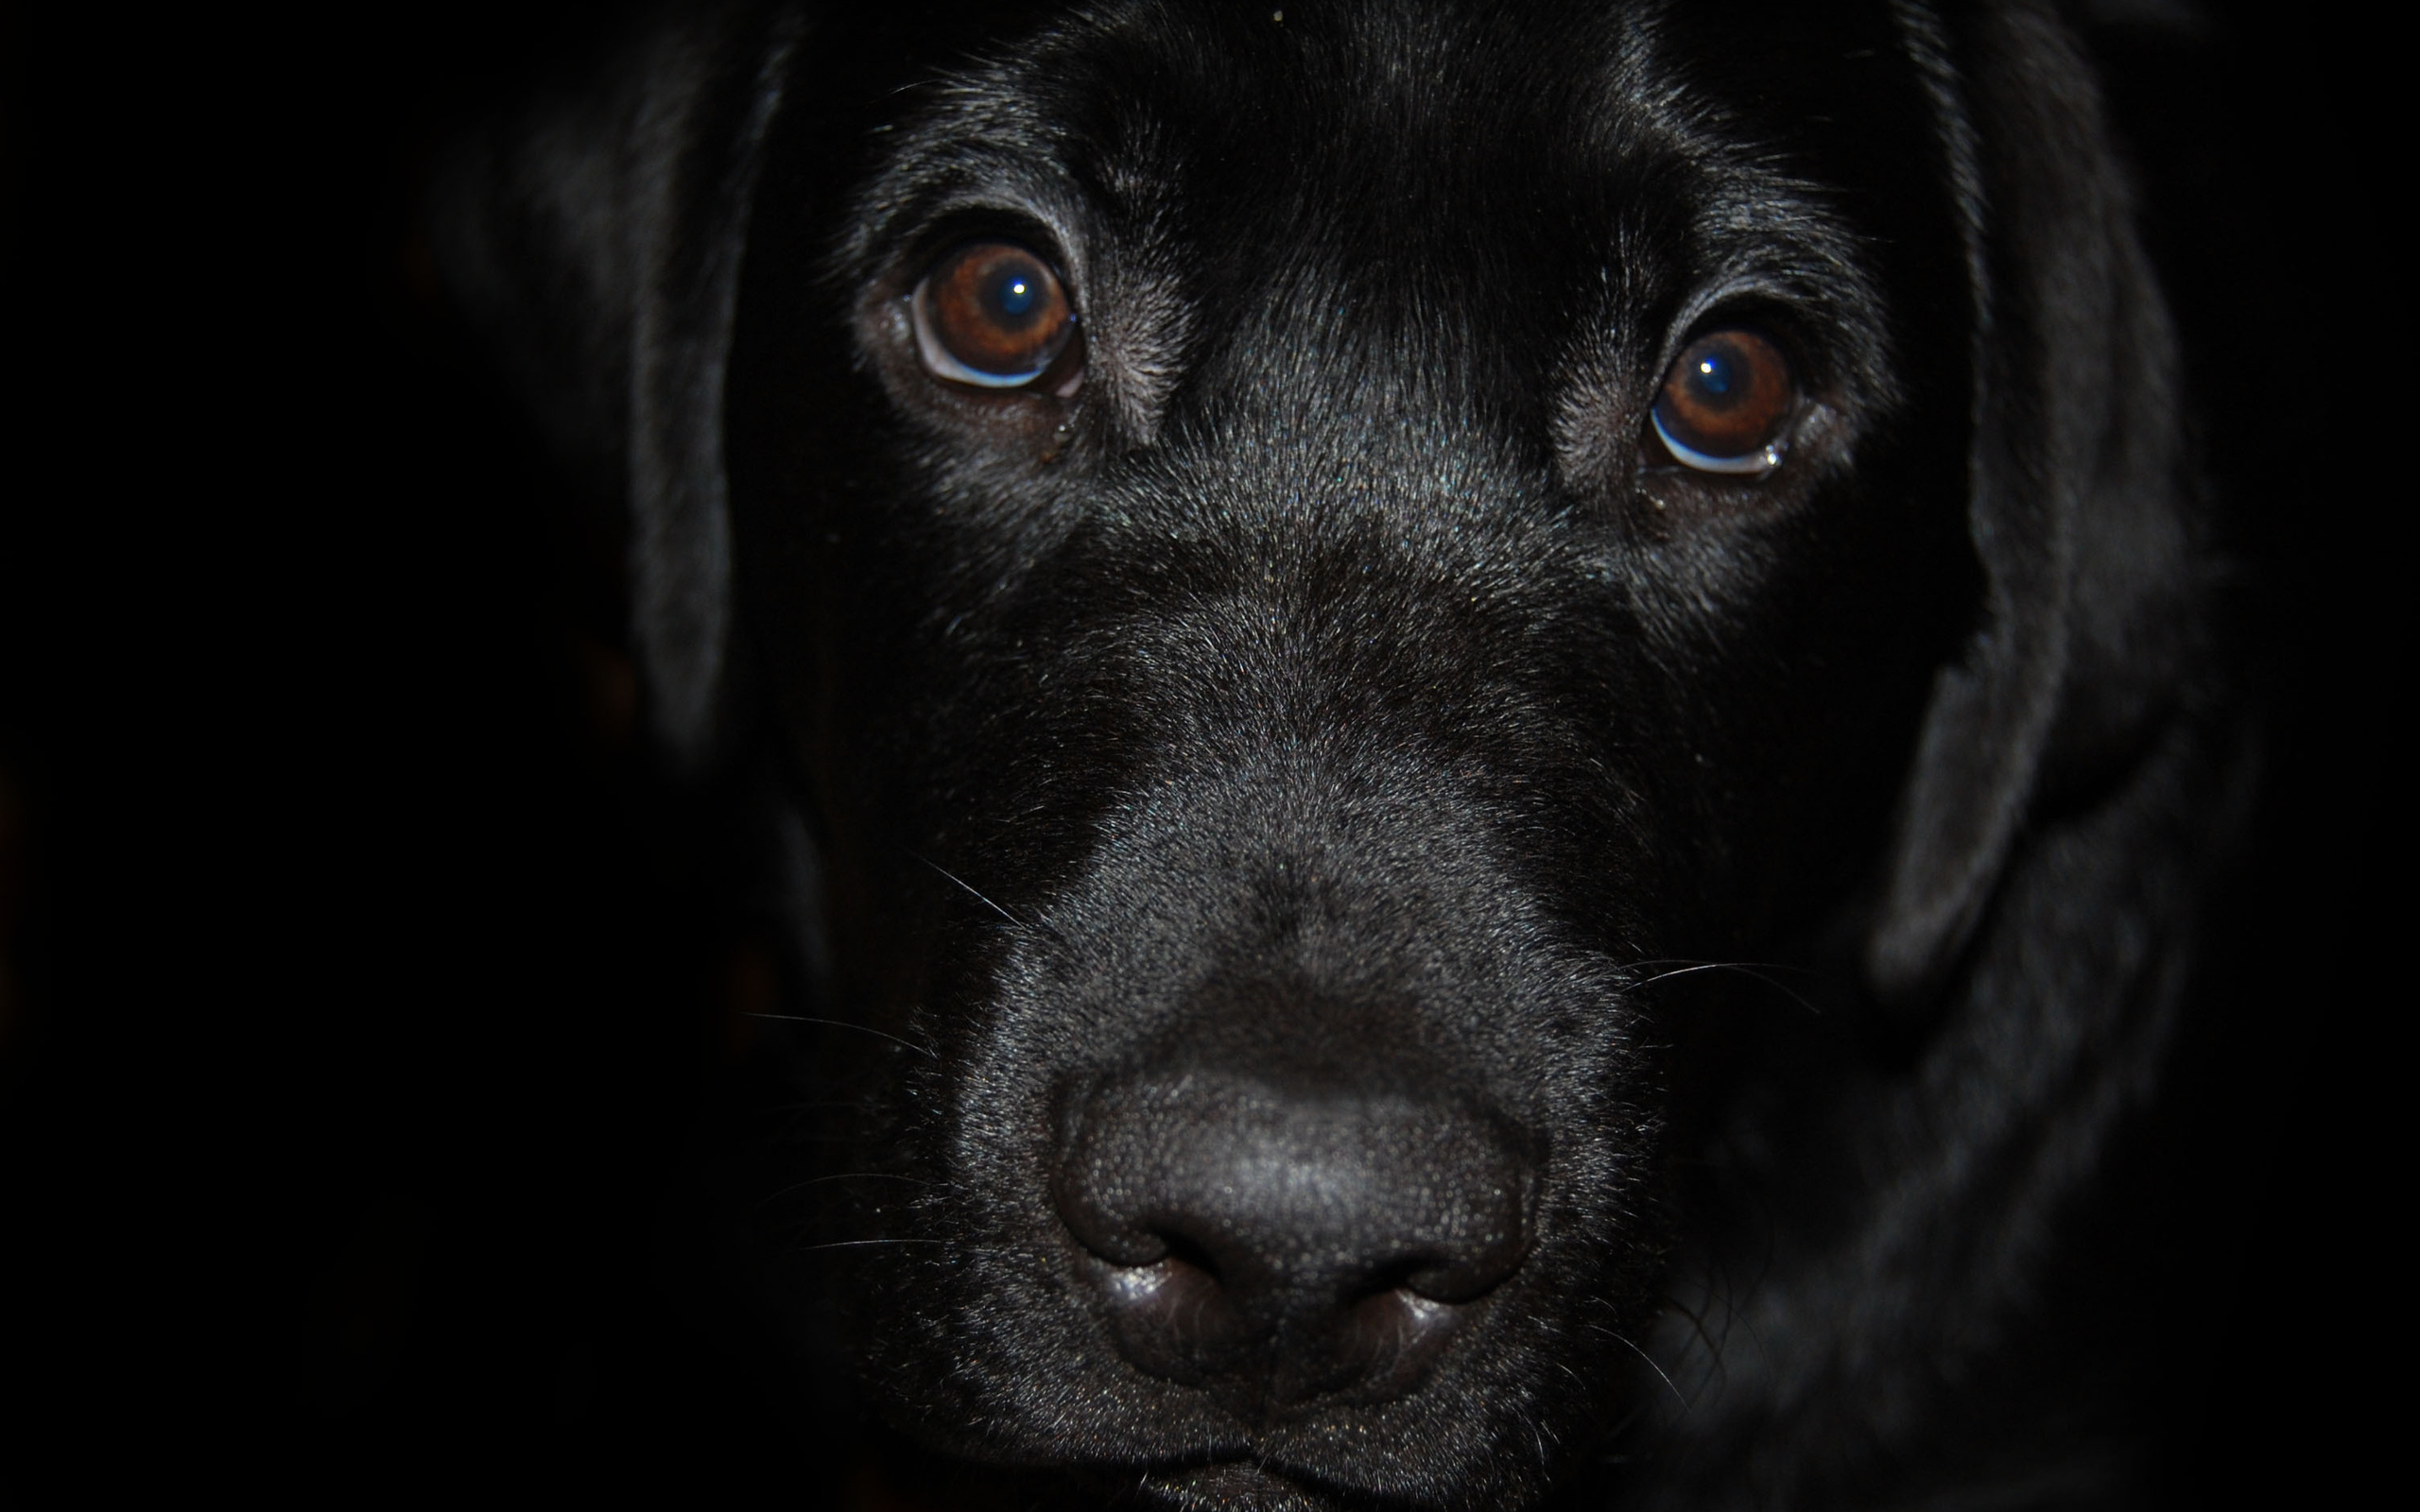 Wallpaper black labrador dog muzzle nose eyes desktop wallpaper 2560x1600